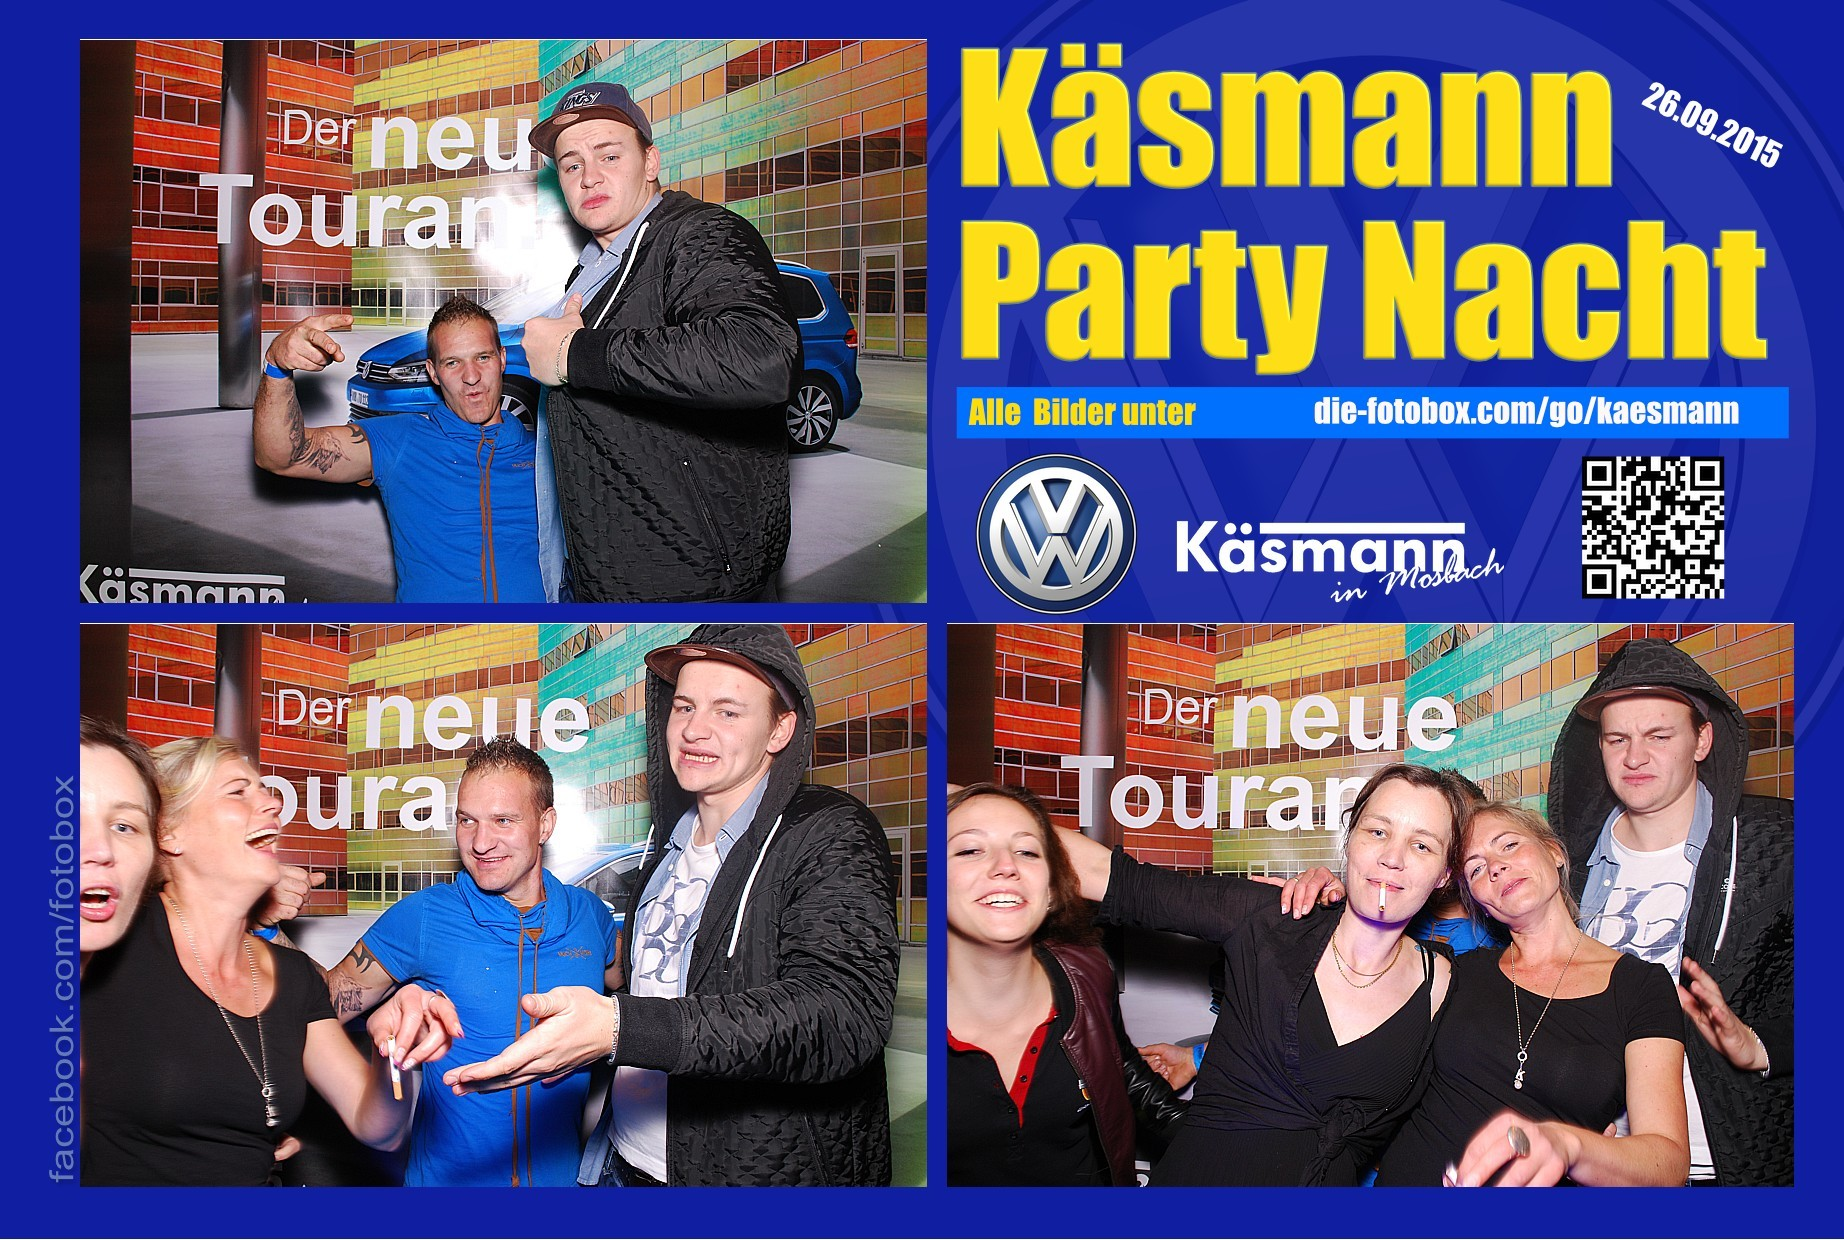 Käsmannparty 2015 - www.die-fotobox.com 01368